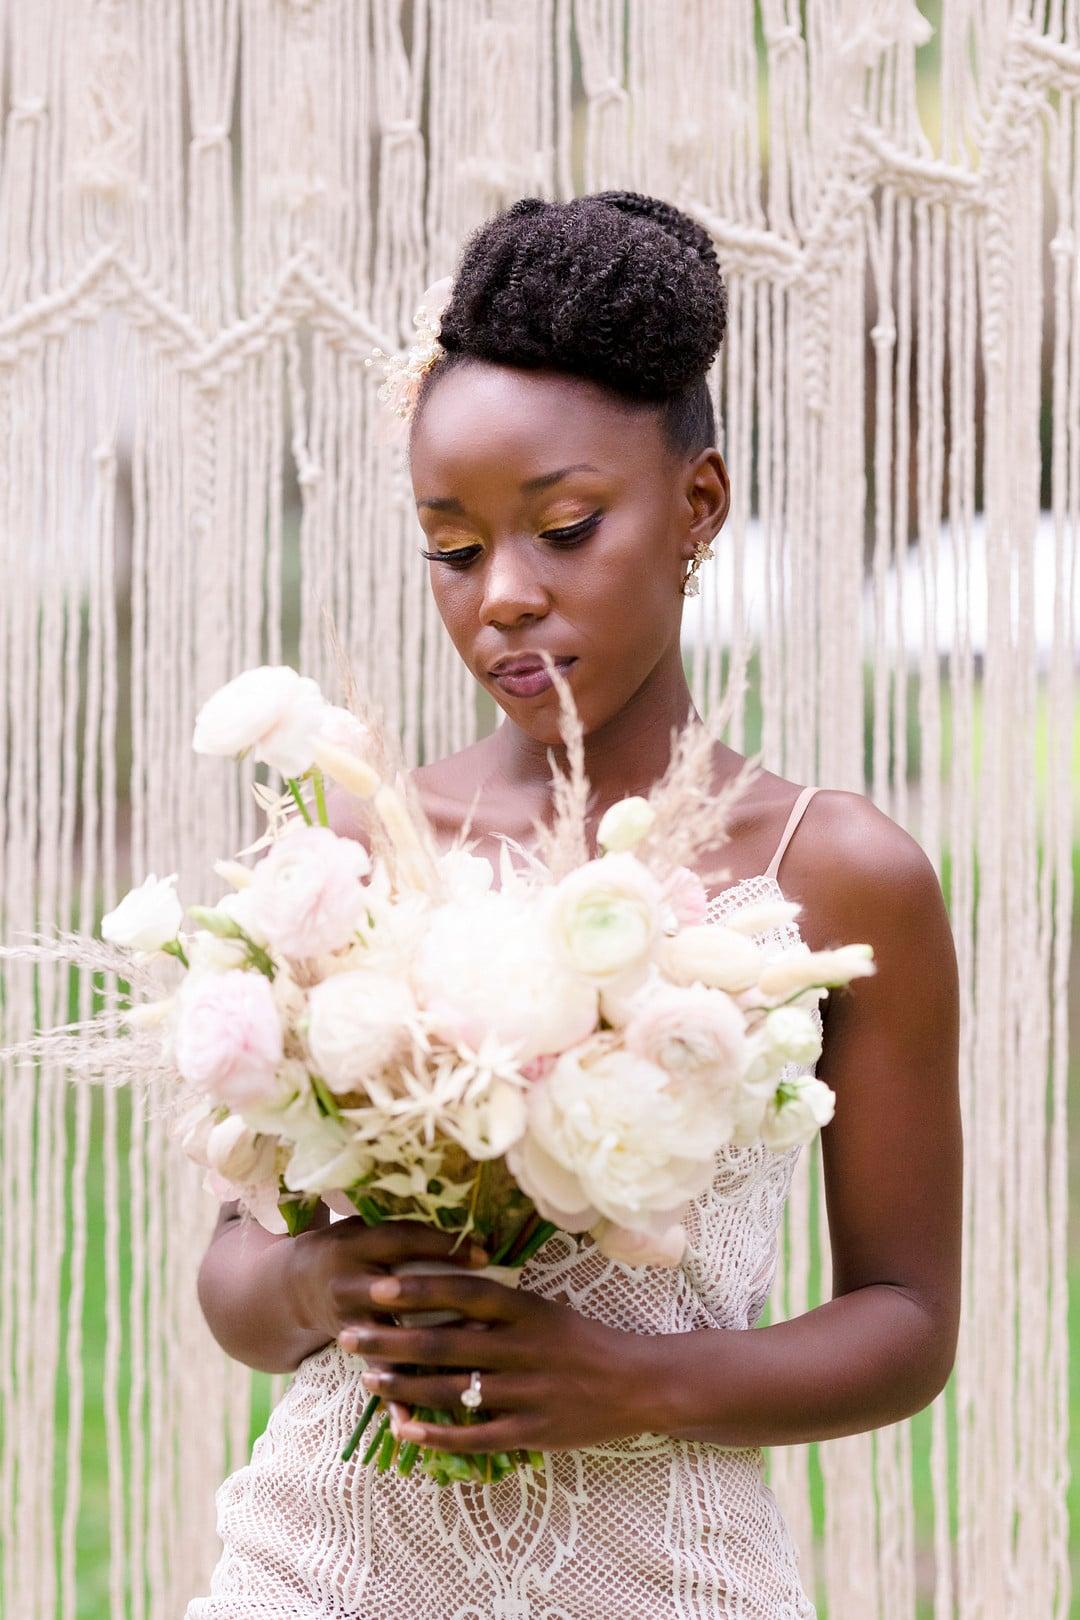 Elegant Boho Wedding Picnic_Susan Dixon Photography, LLC_susan-dixon-015_low